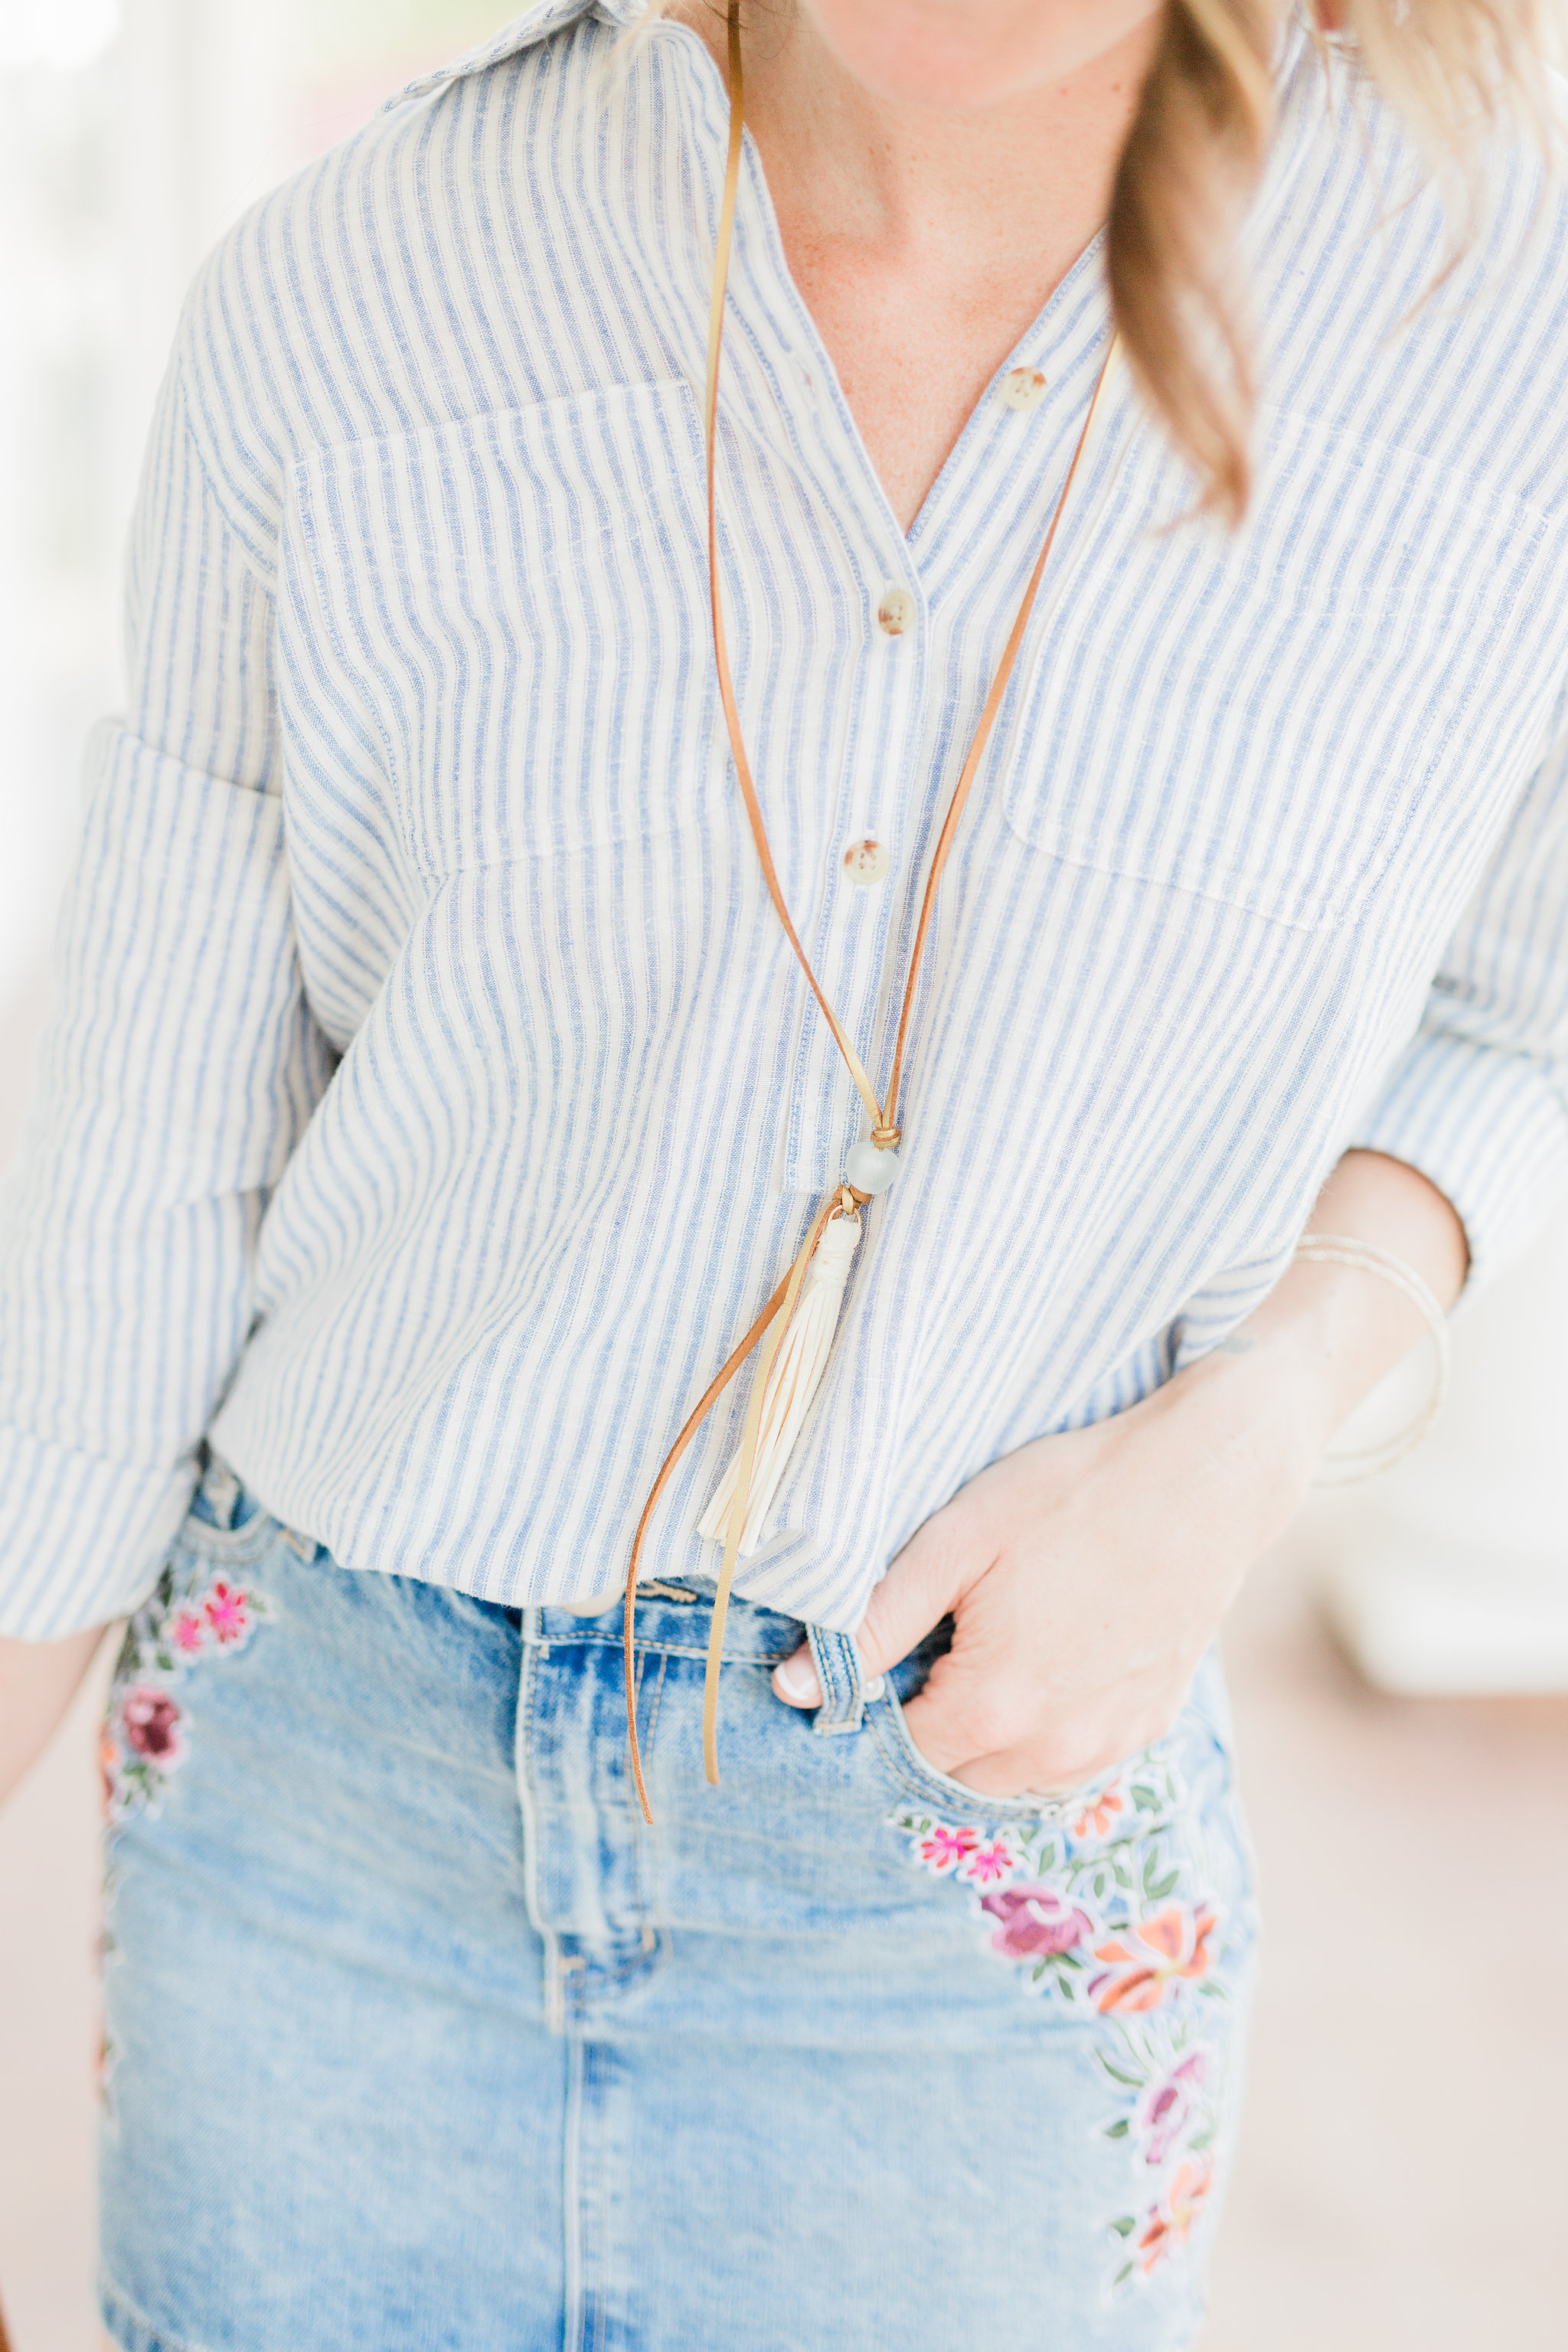 hey jode, houston blog, style blog, boost confidence